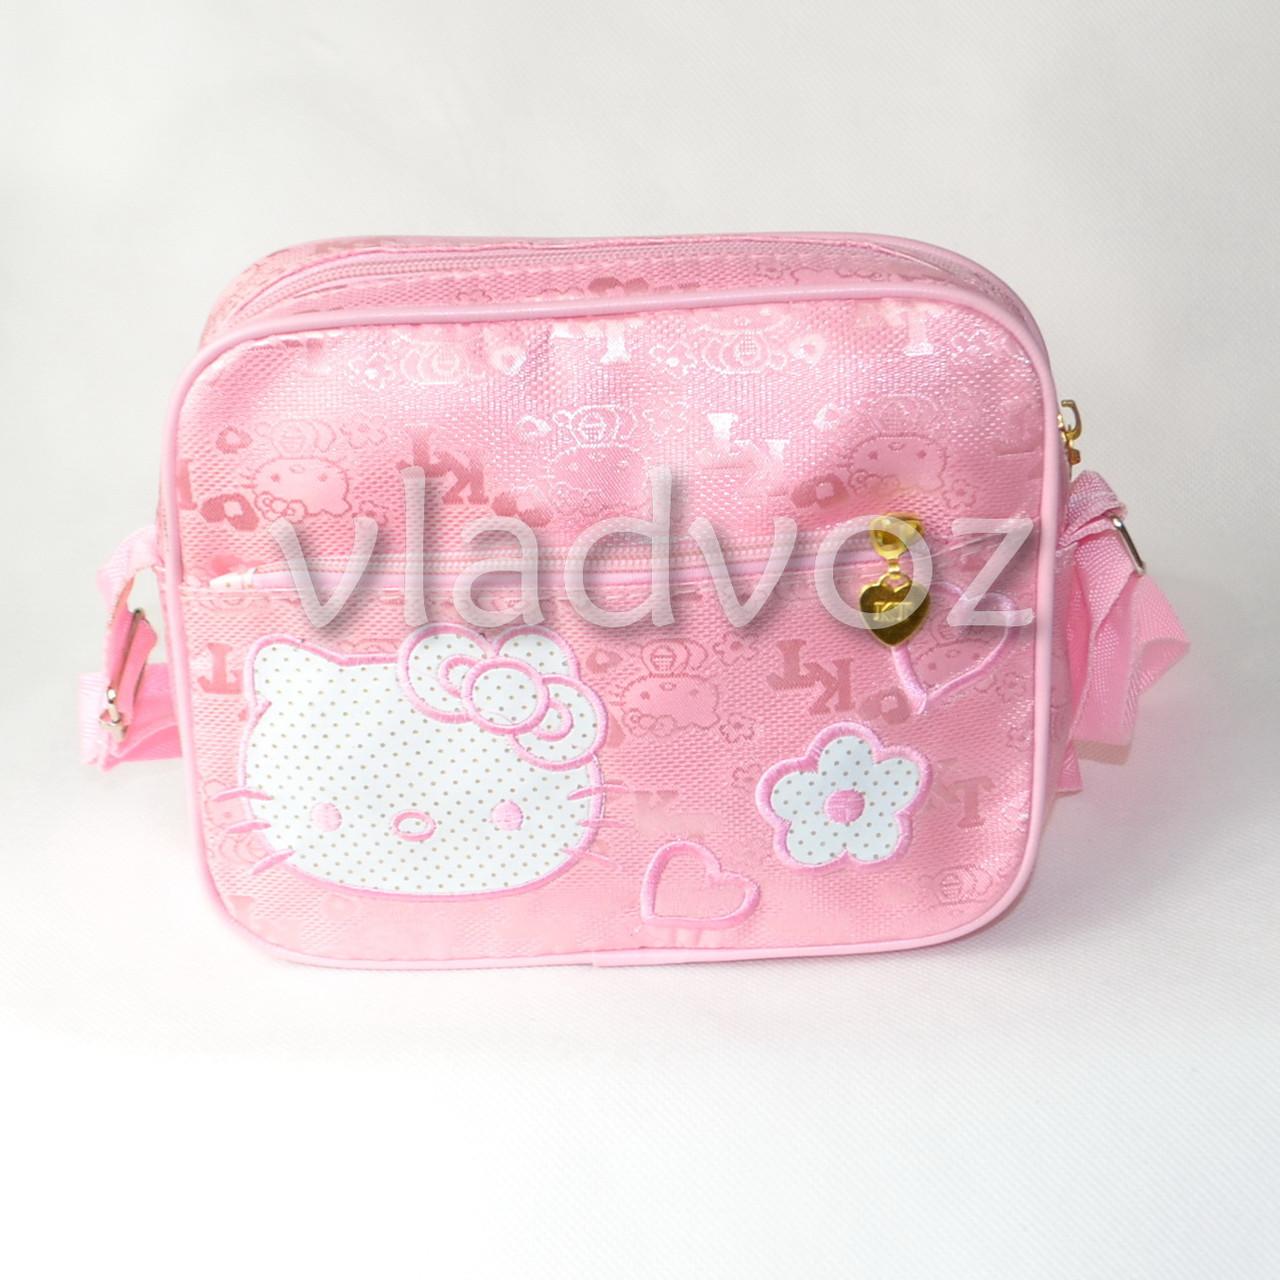 f3c97aac1ee5 Детская Сумка Сумочка Hello Kitty Розовая — в Категории